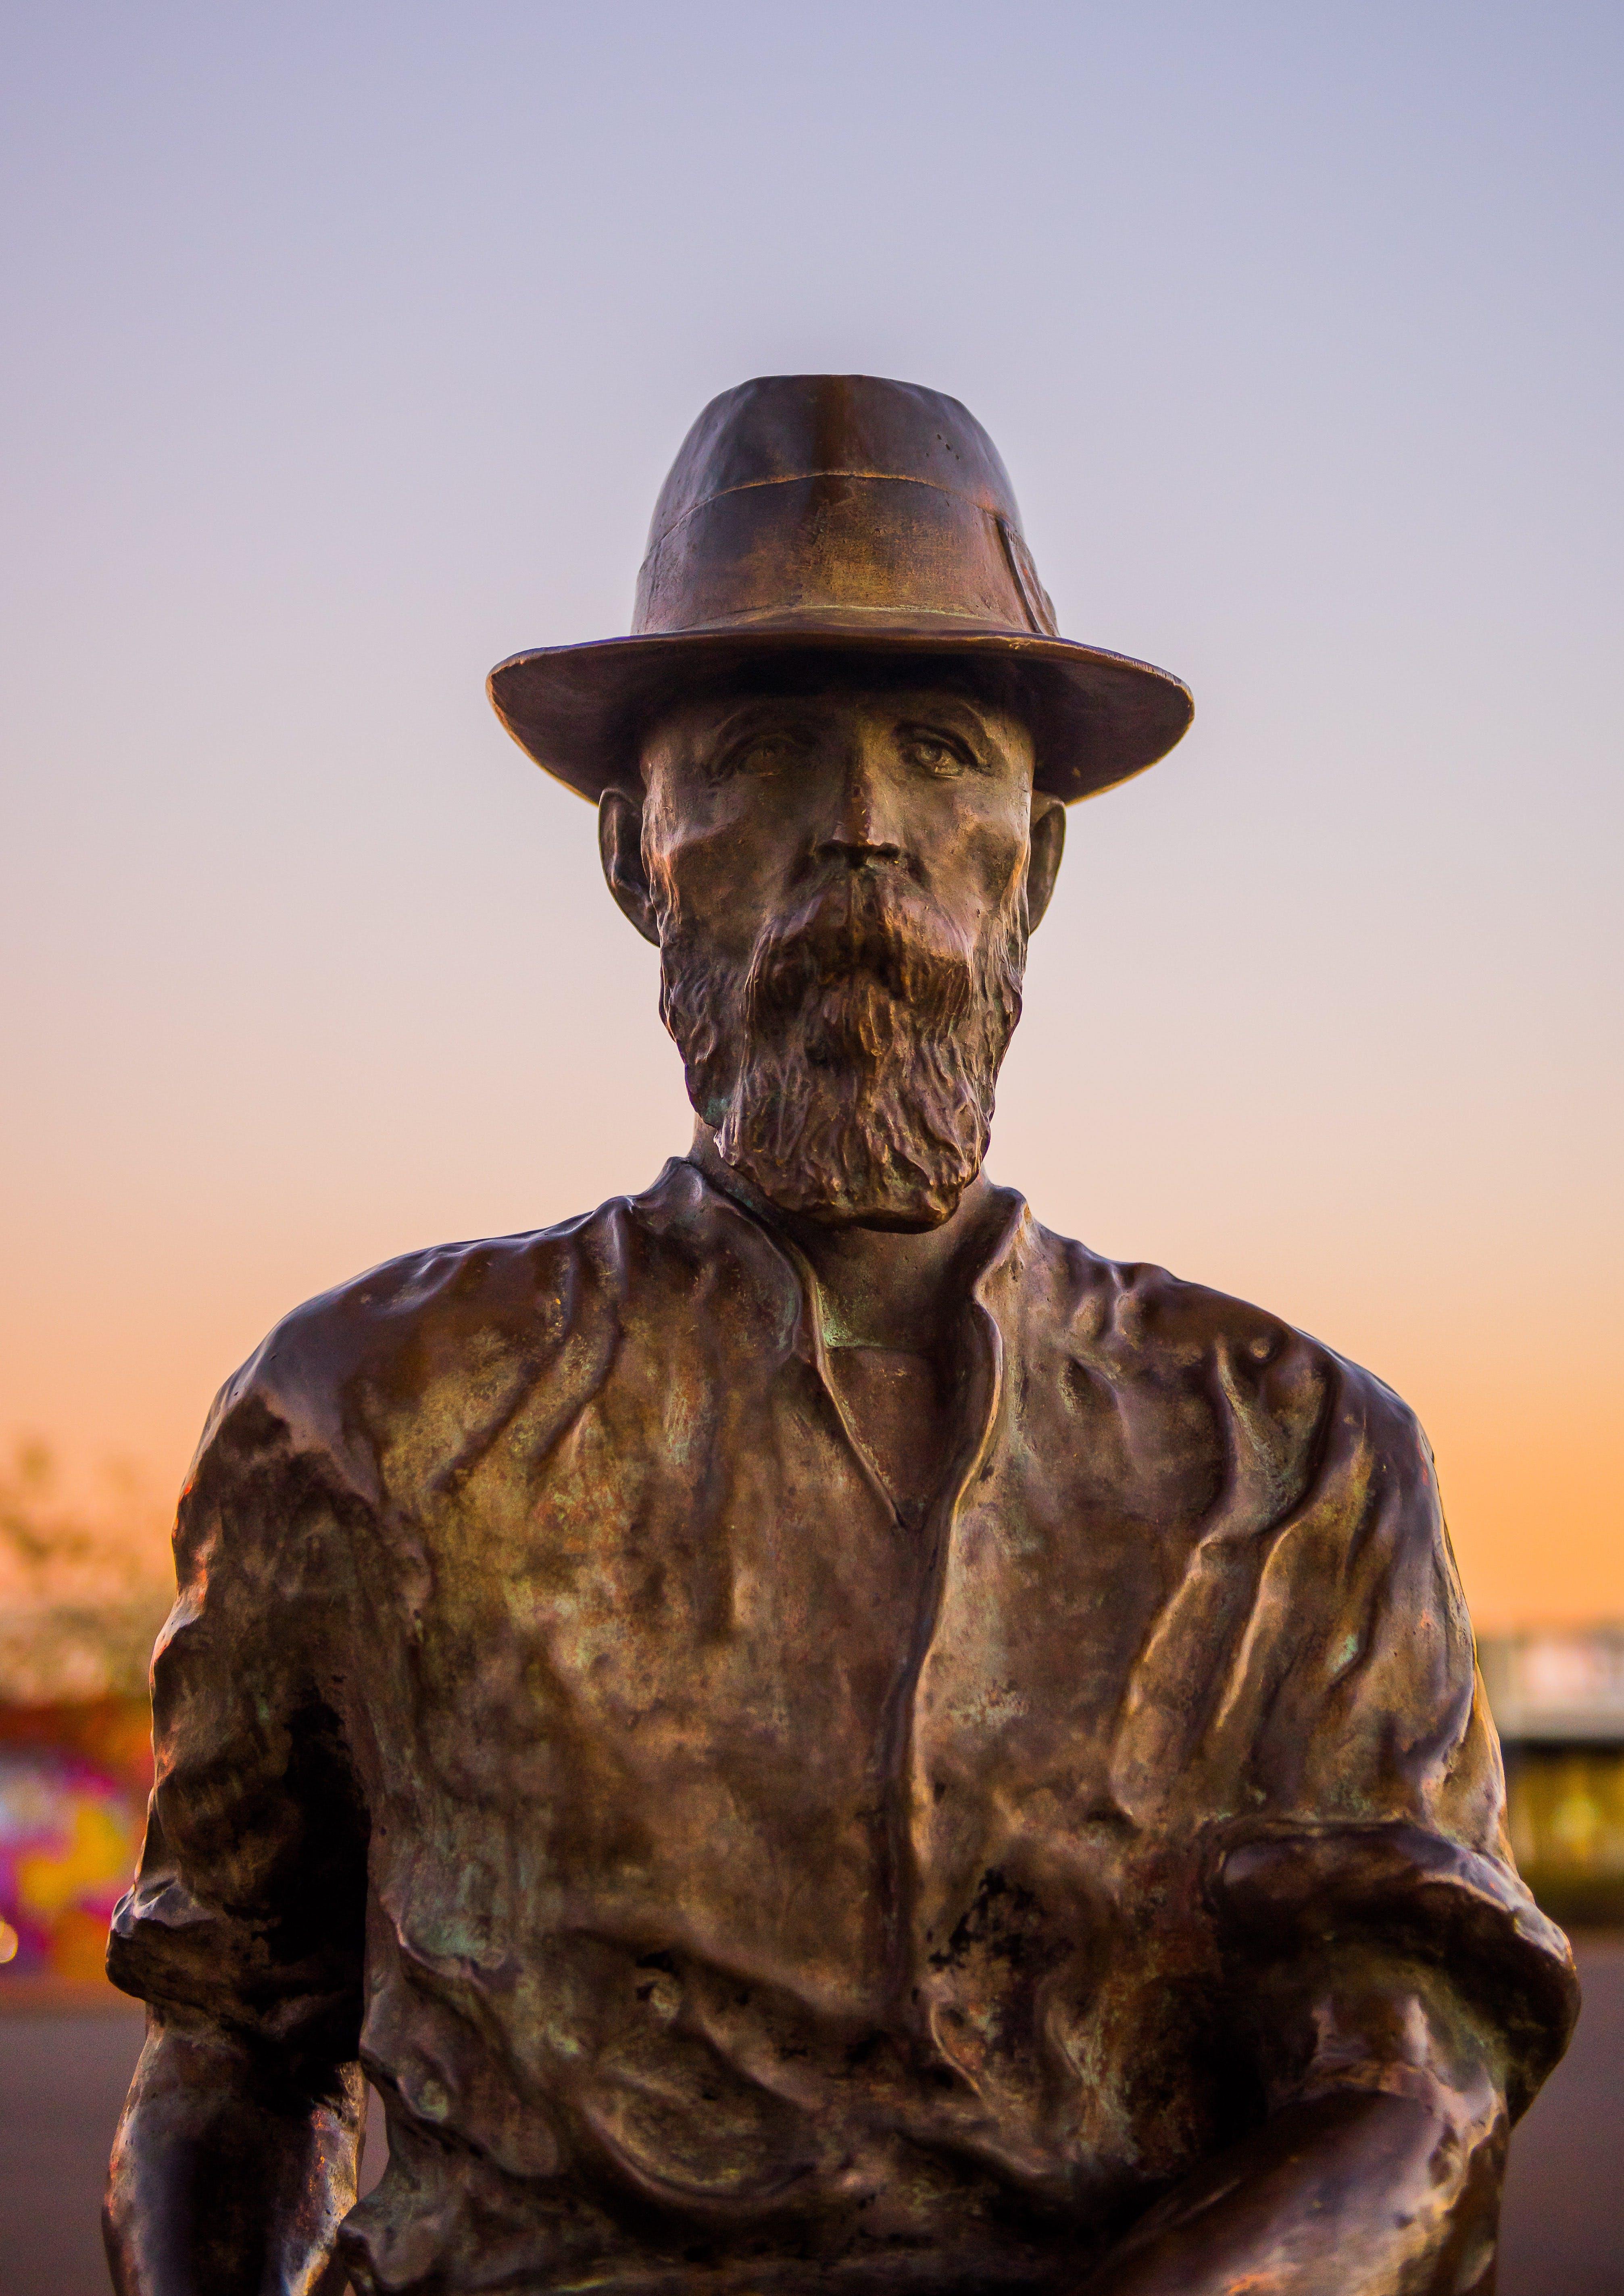 Paddy Hannan Statue, Kalgoorlie, Western Australia